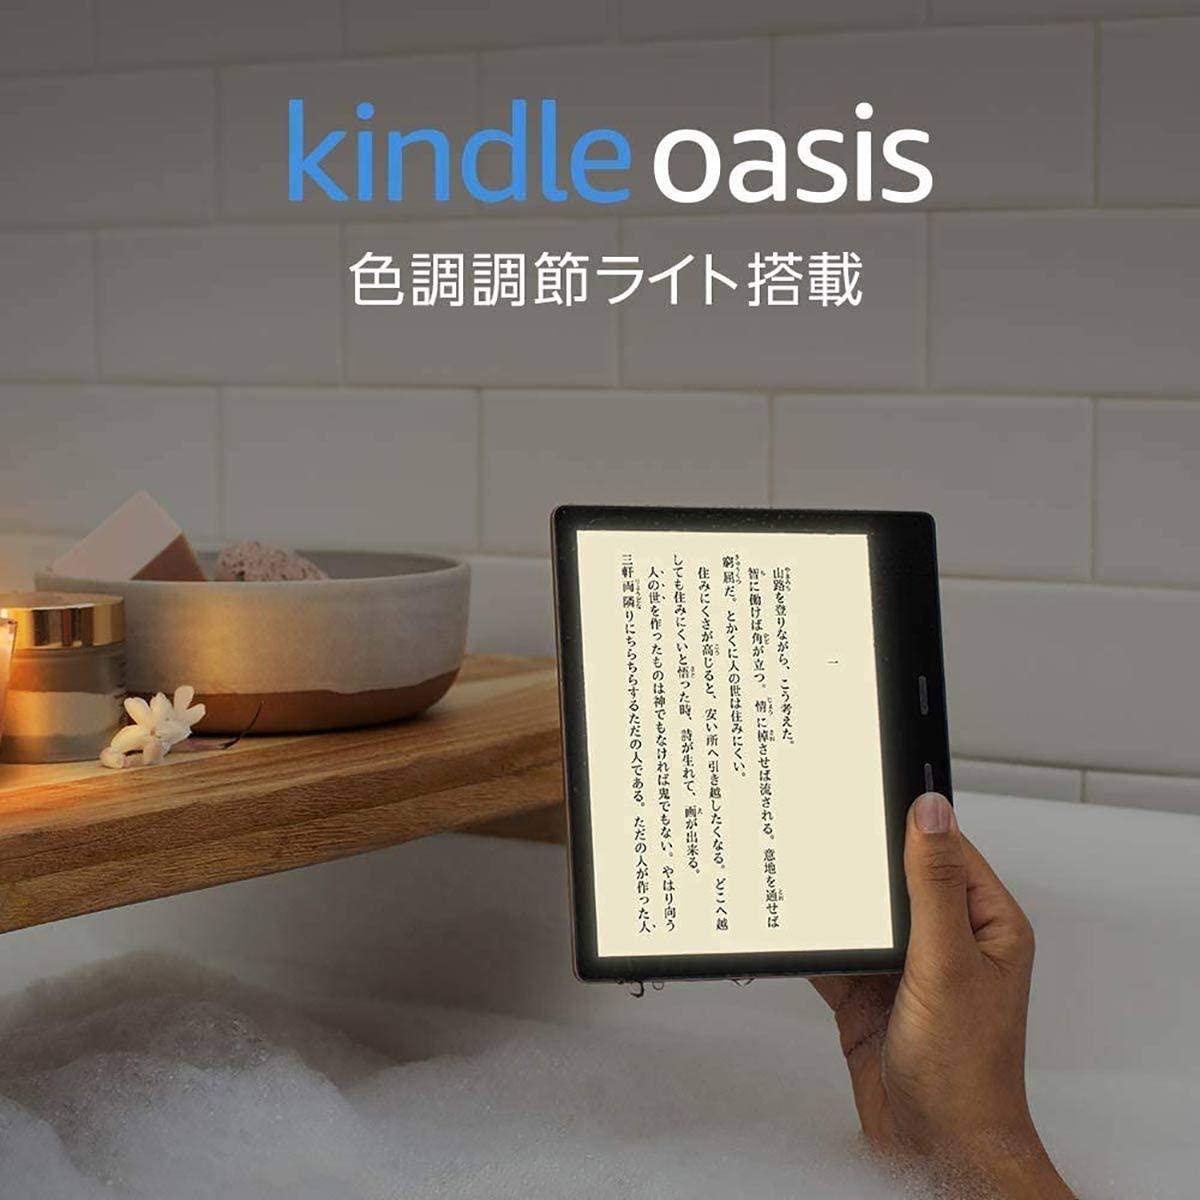 【Amazon】Kindle Oasis 色調調節ライト搭載 Wi-Fi 32GB 電子書籍リーダー